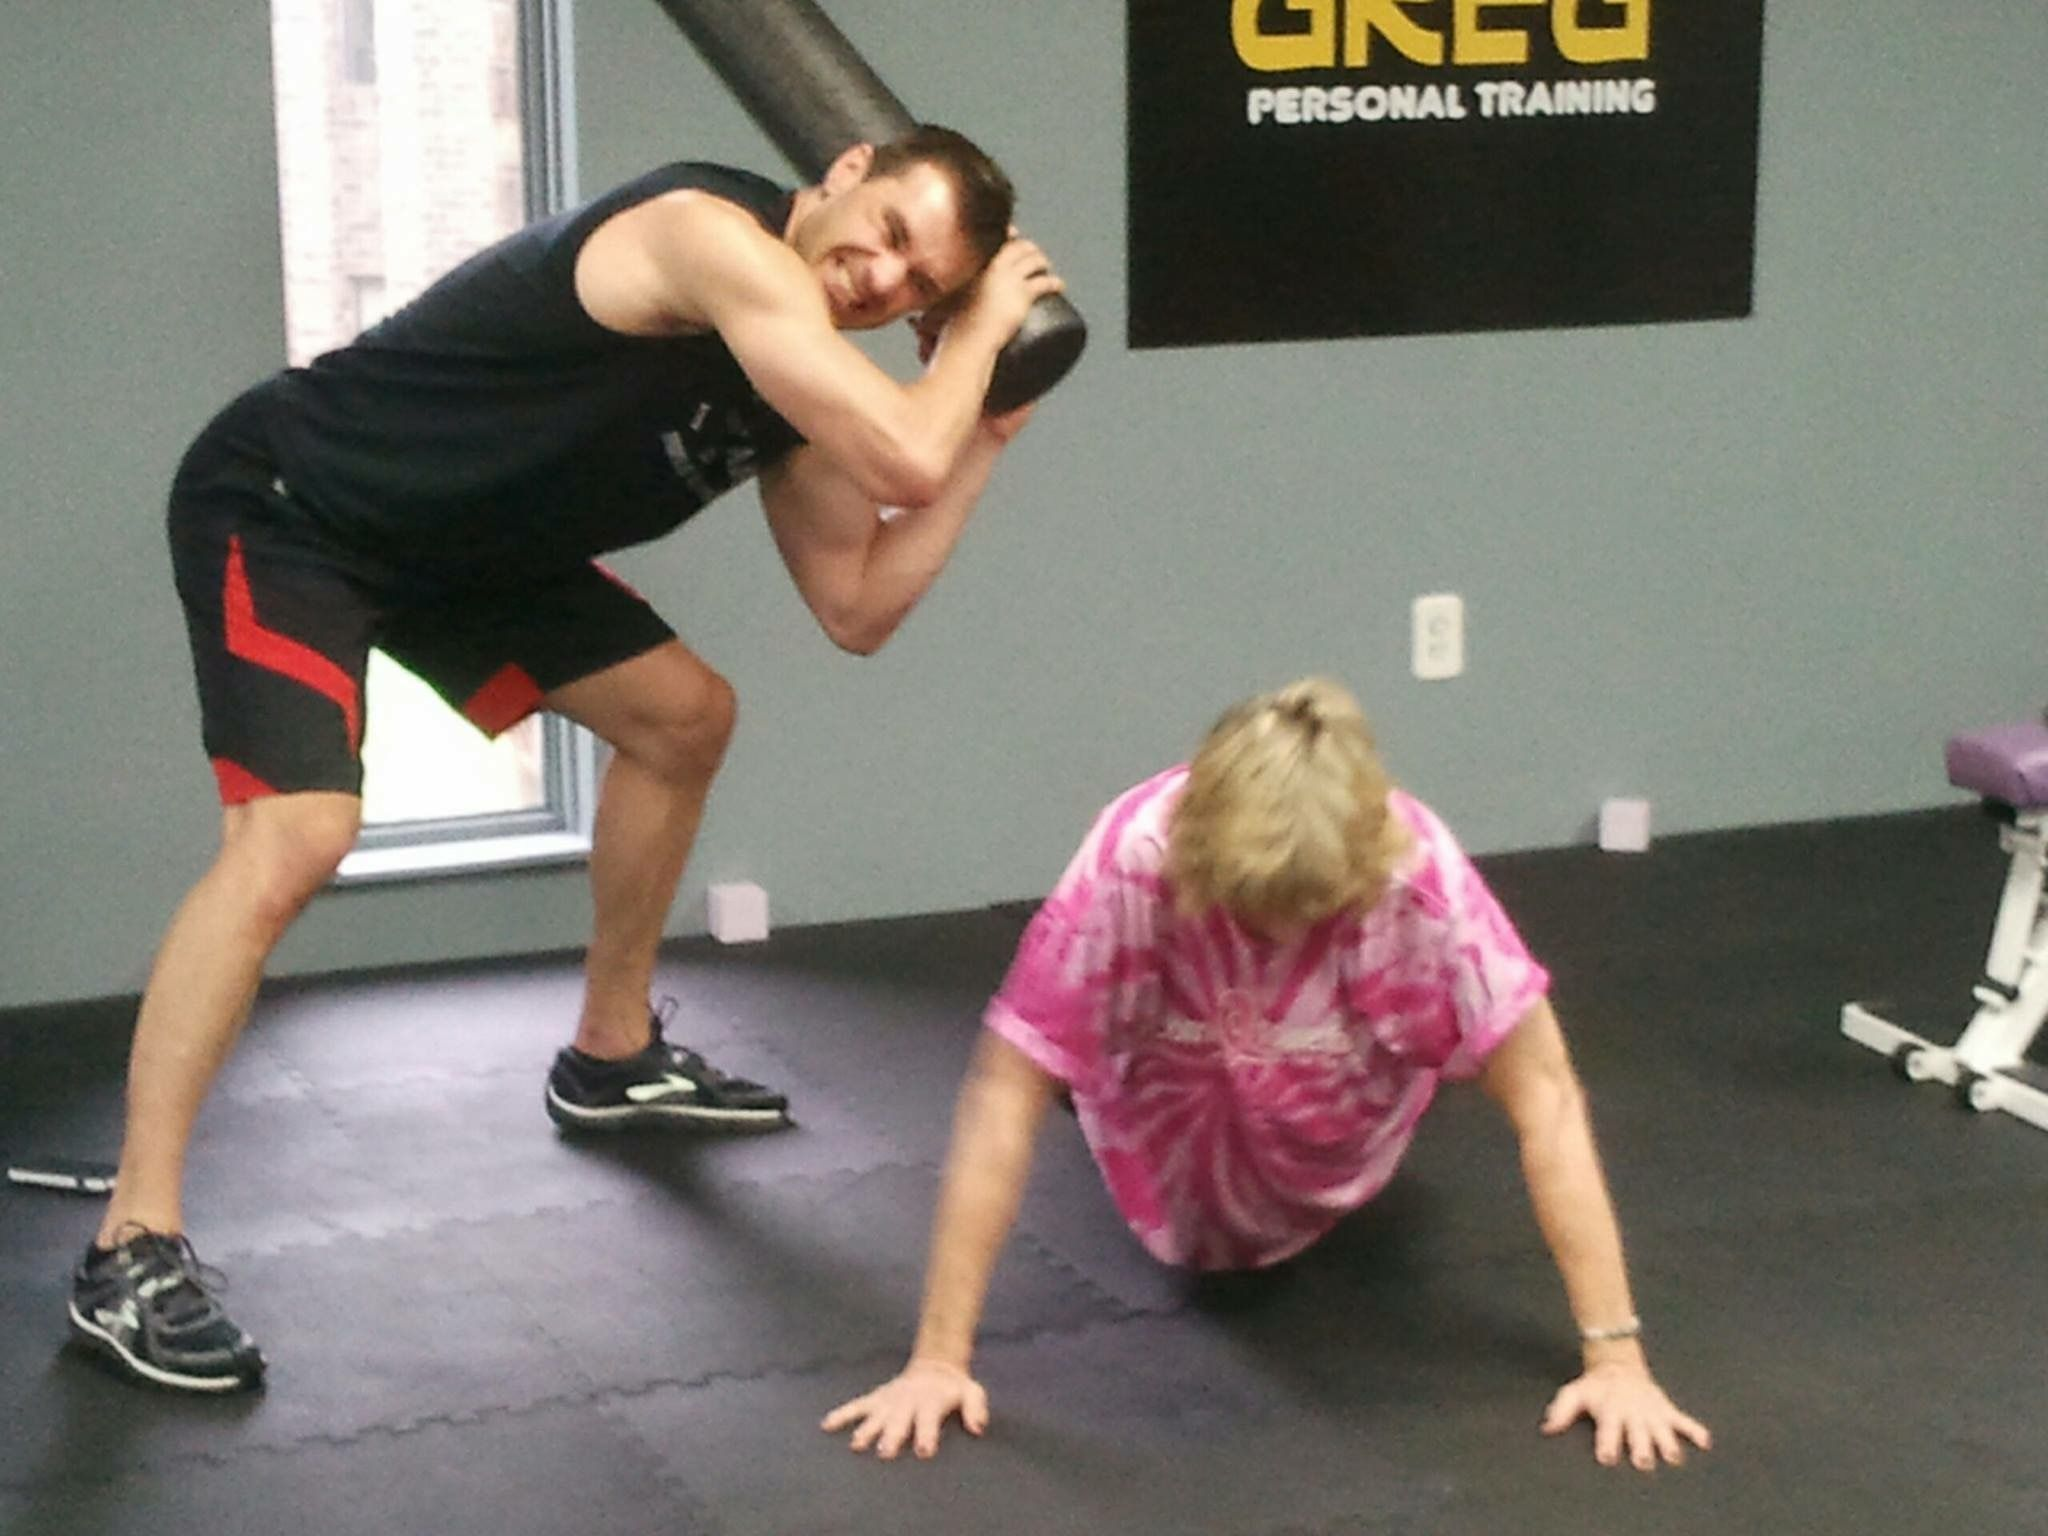 Pin By Greg Jasnikowski On Personal Trainer Columbus Ohio Body By Greg Personal Training Training Motivation Personal Trainer